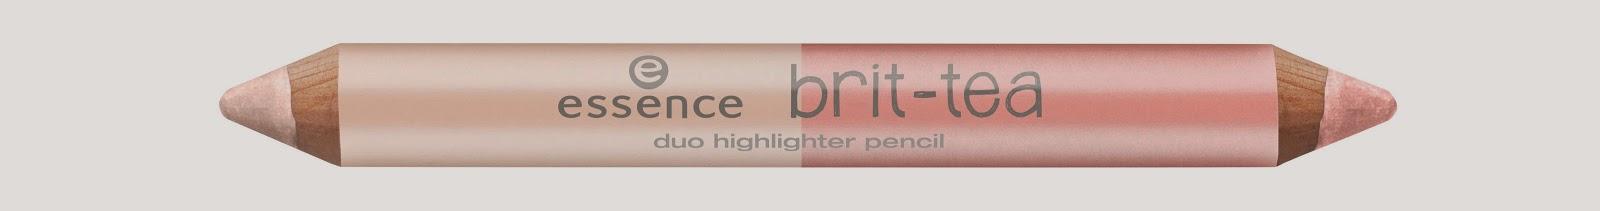 essence brit-tea – duo highlighter pencil - www.annitschkasblog.de